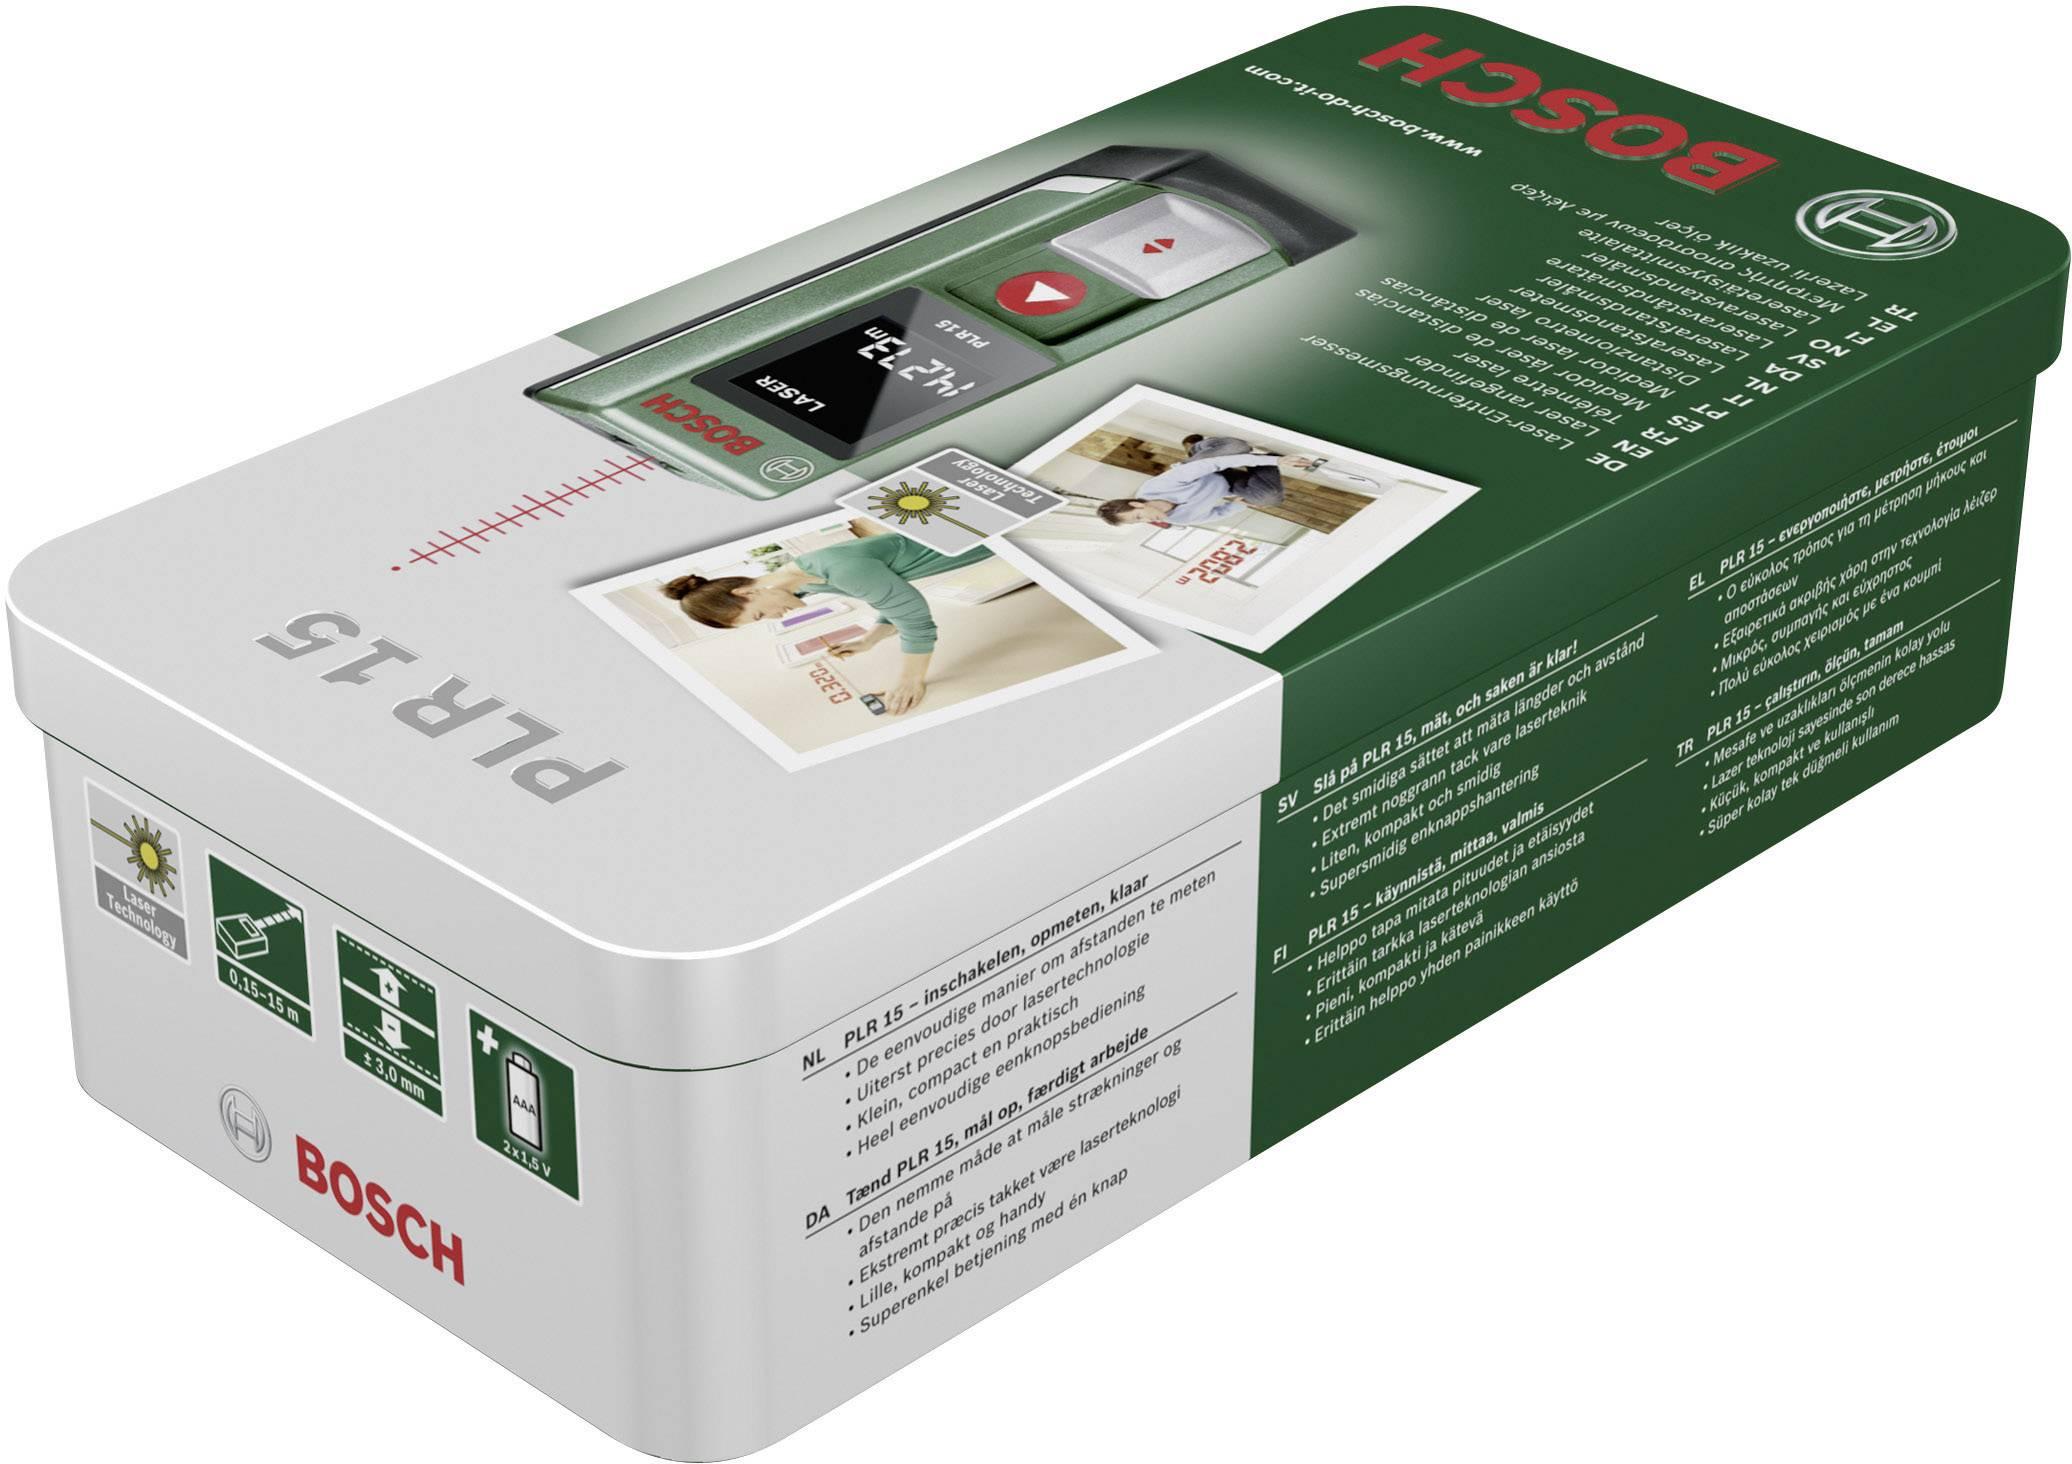 Infrarot Entfernungsmesser Bosch : Bosch entfernungsmesser plr diy digitaler laser